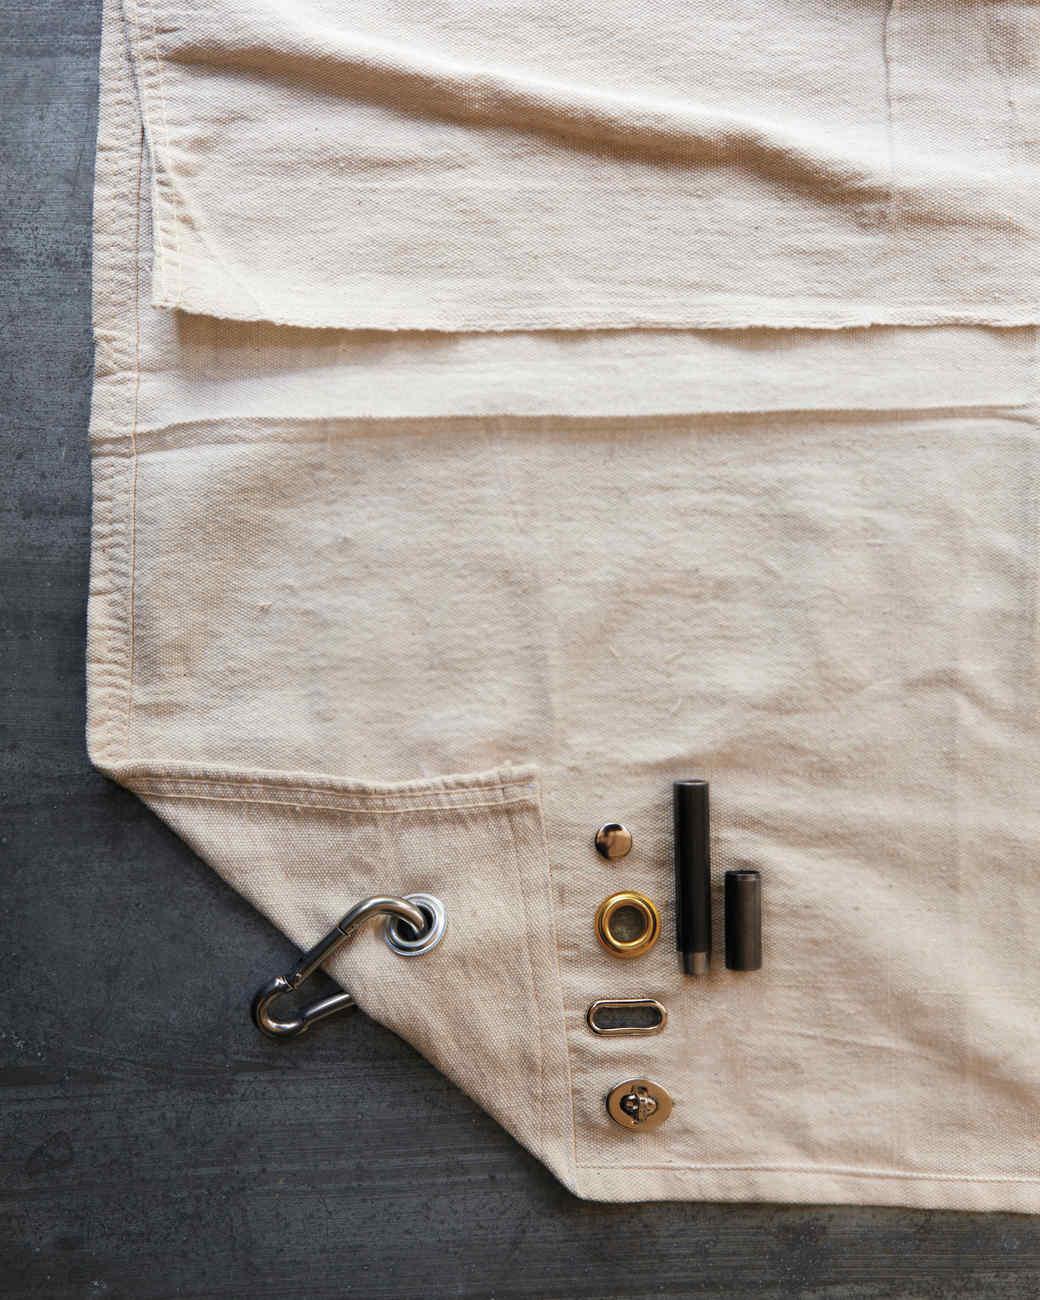 drop-cloth-grommet-glossary-0473-mld109920.jpg